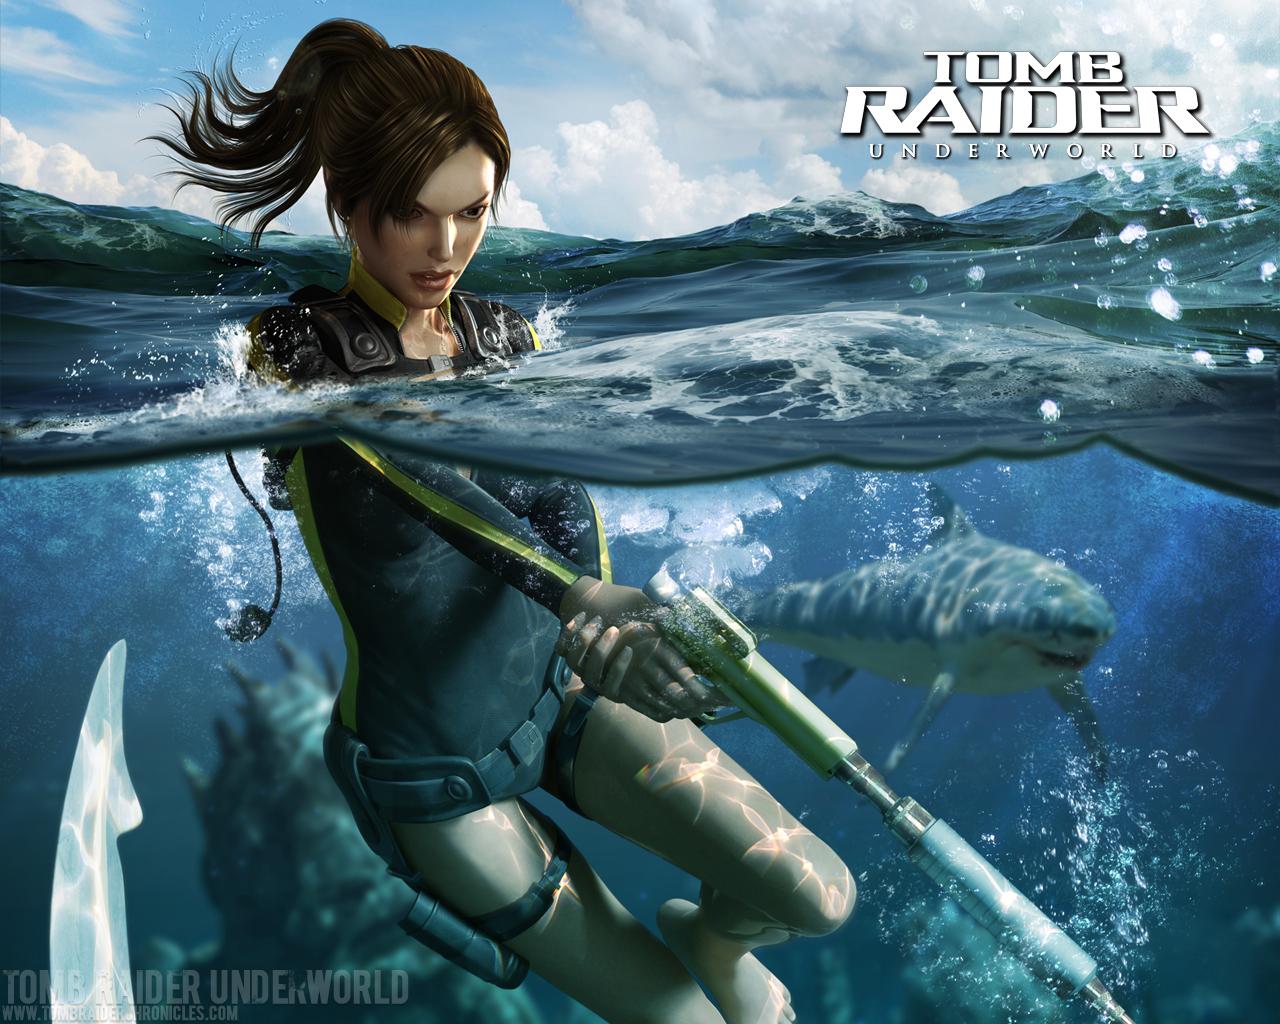 Lara croft underworld hentia pic